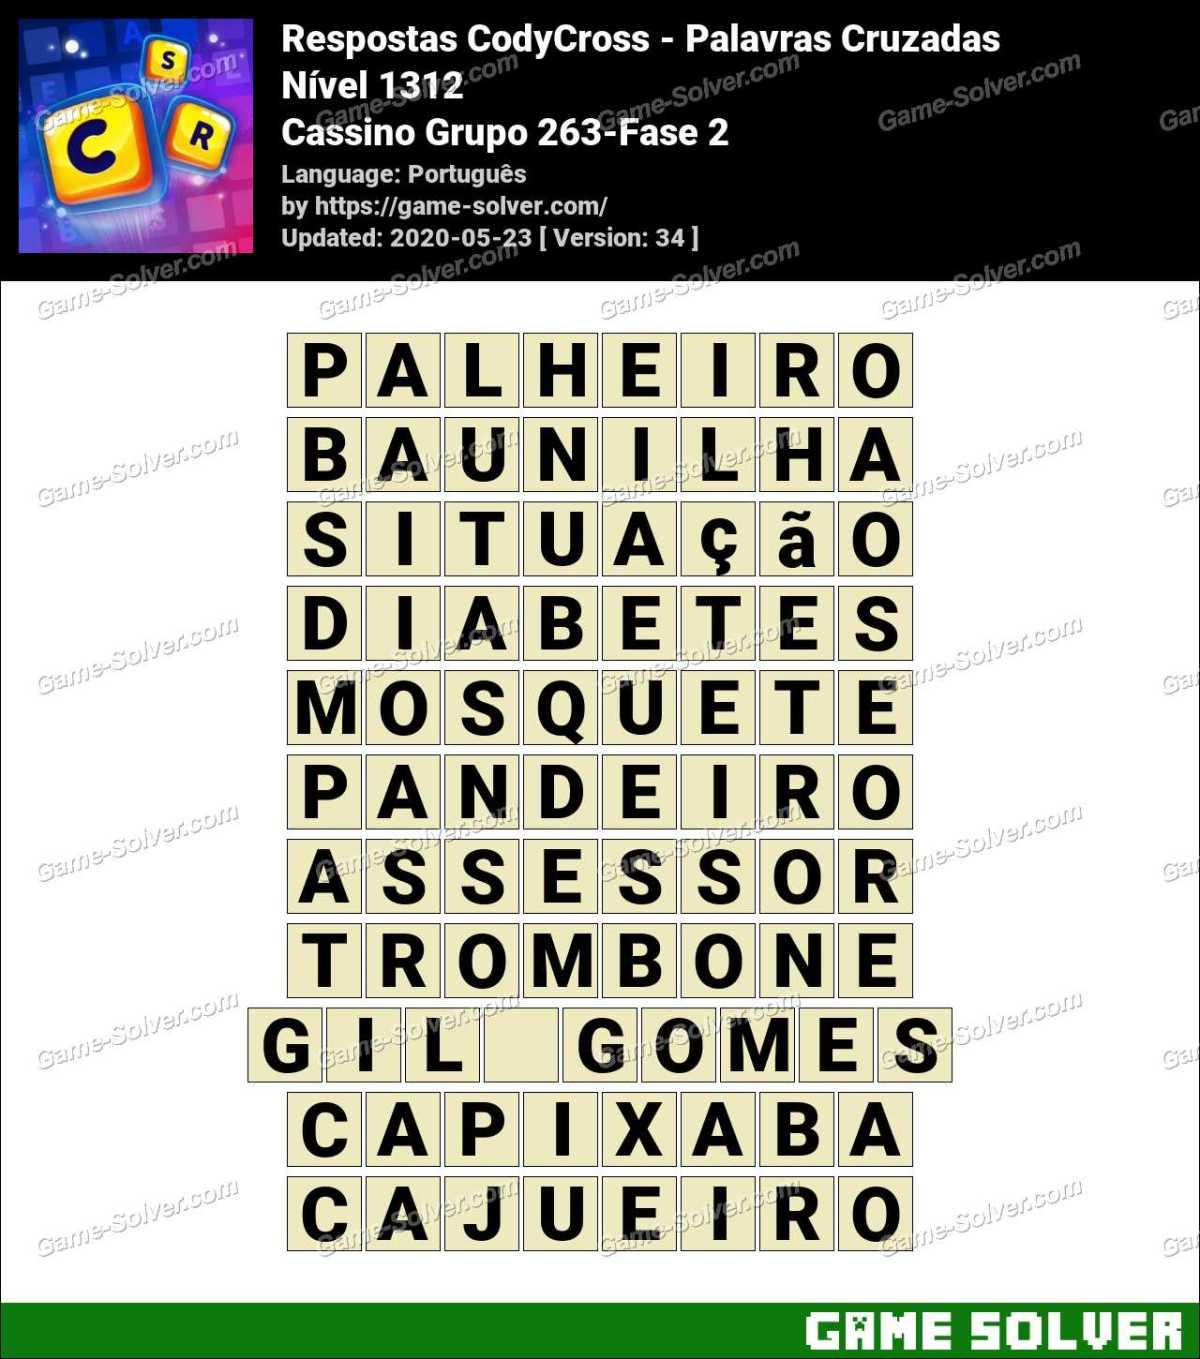 Respostas CodyCross Cassino Grupo 263-Fase 2